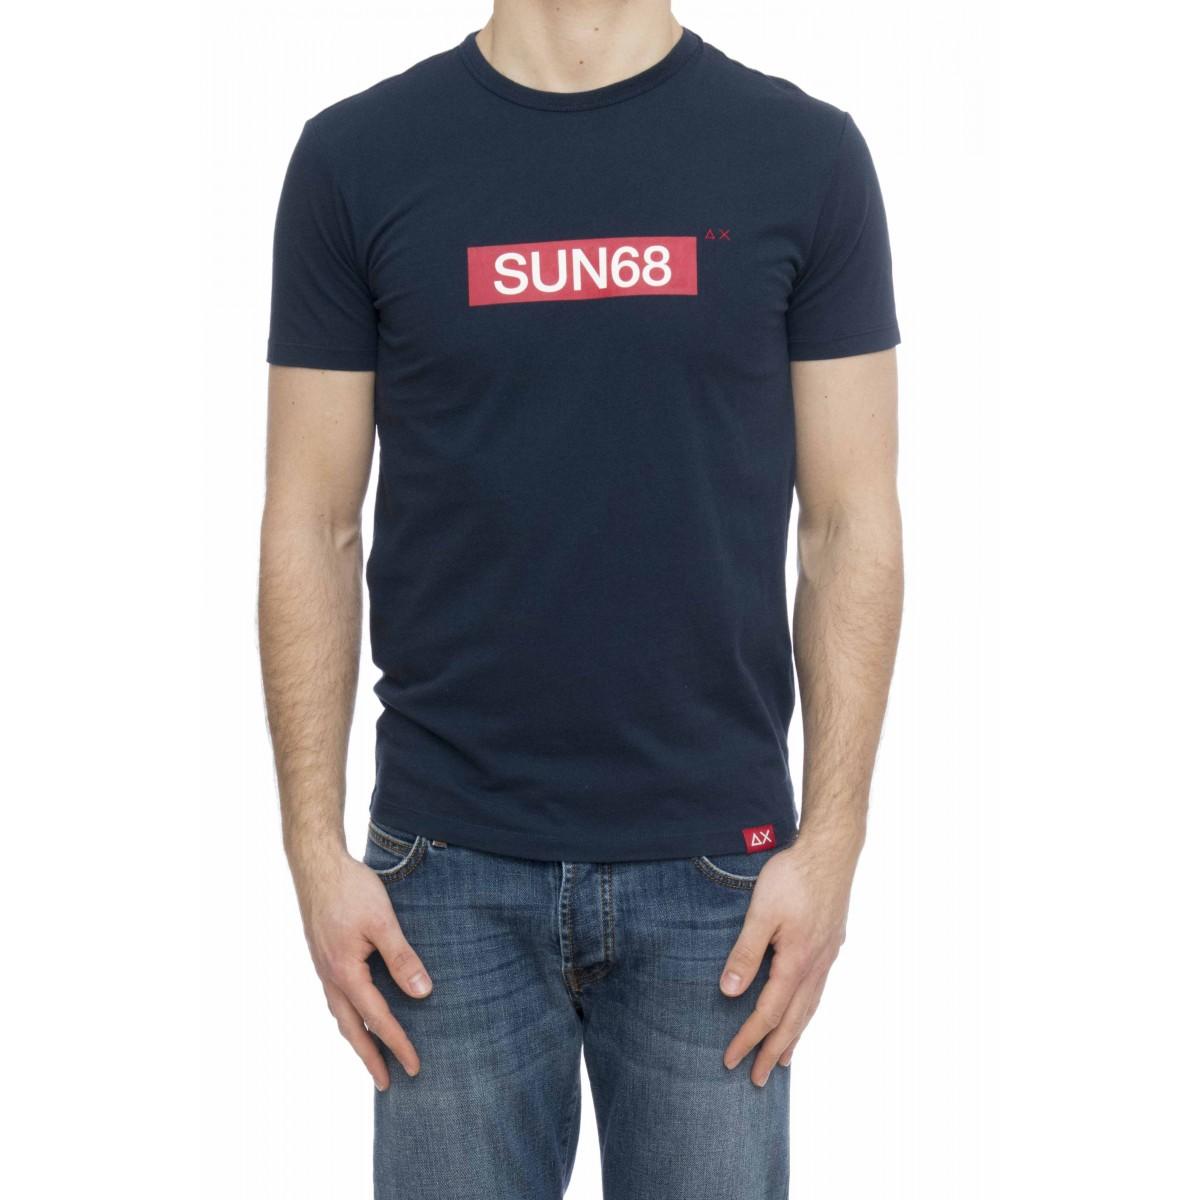 T-shirt uomo - T19105 t-shirt logo